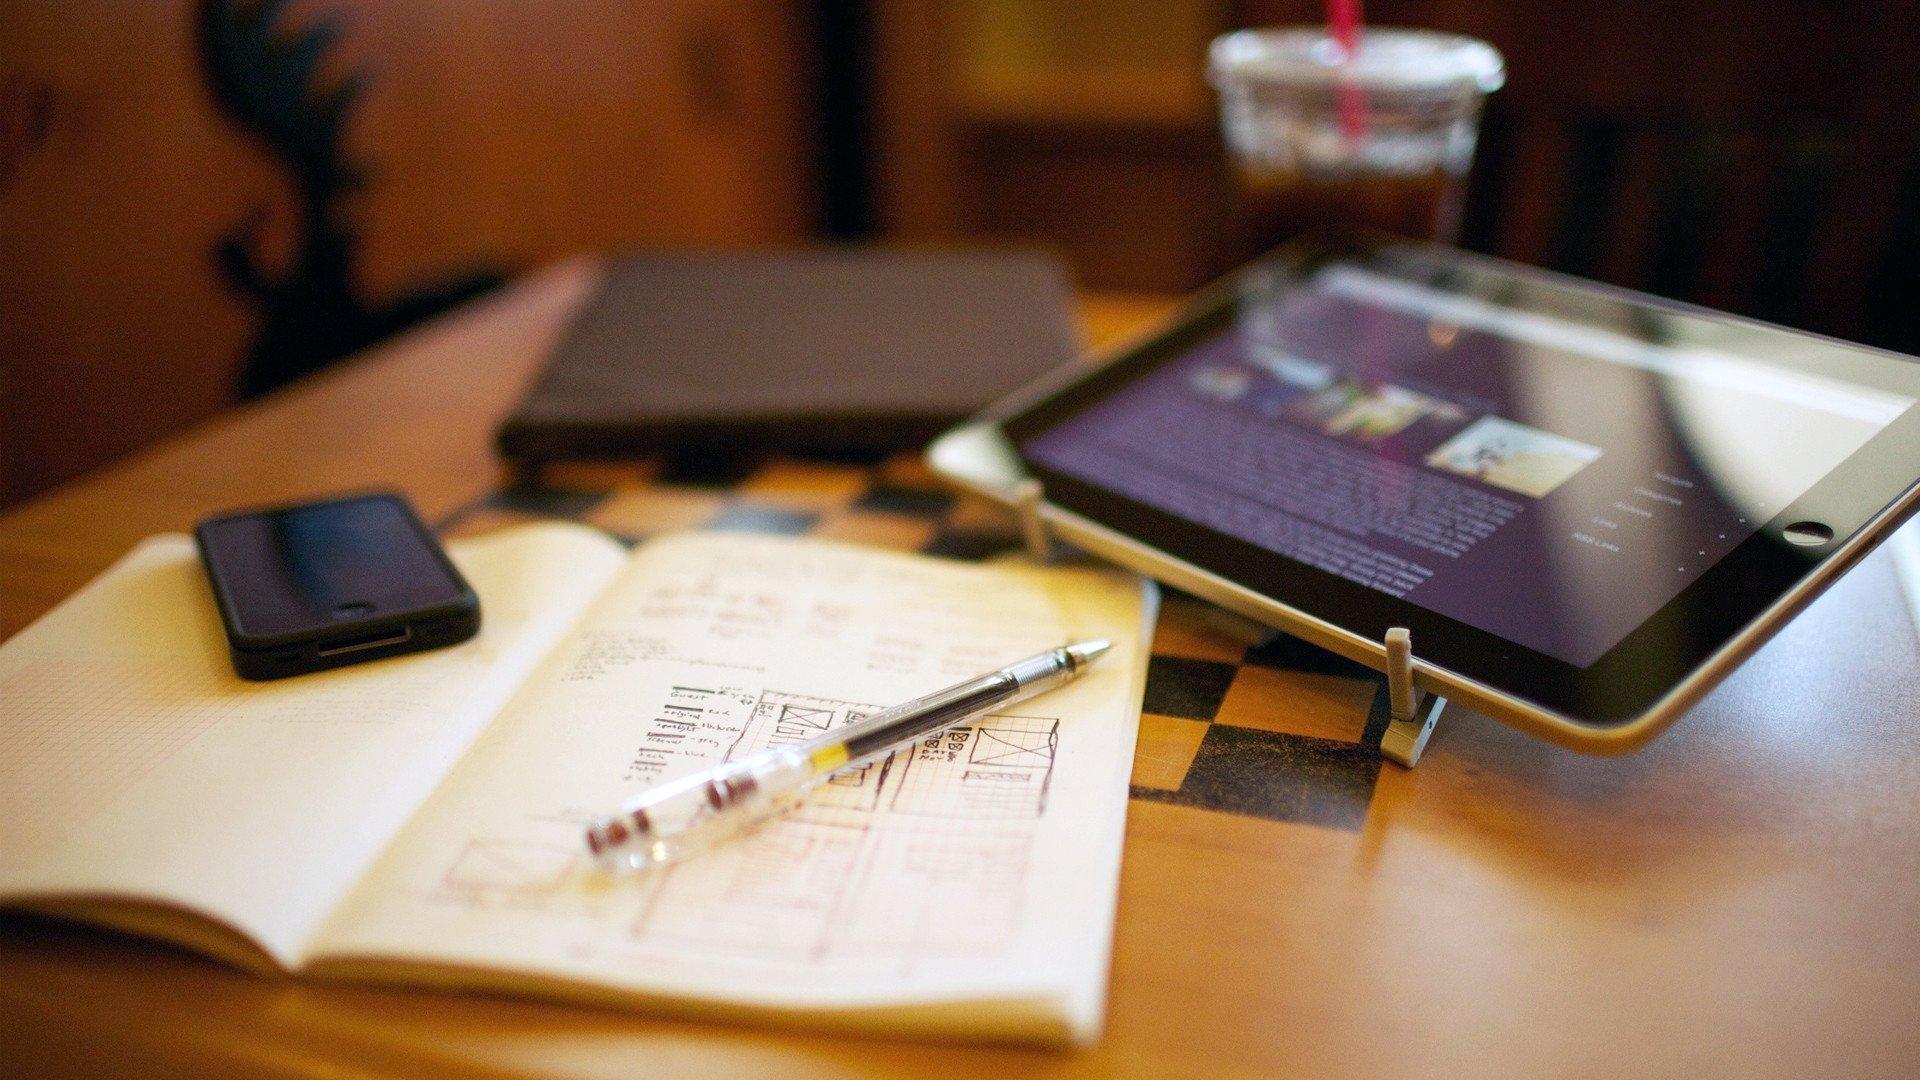 workplacehabits.jpg